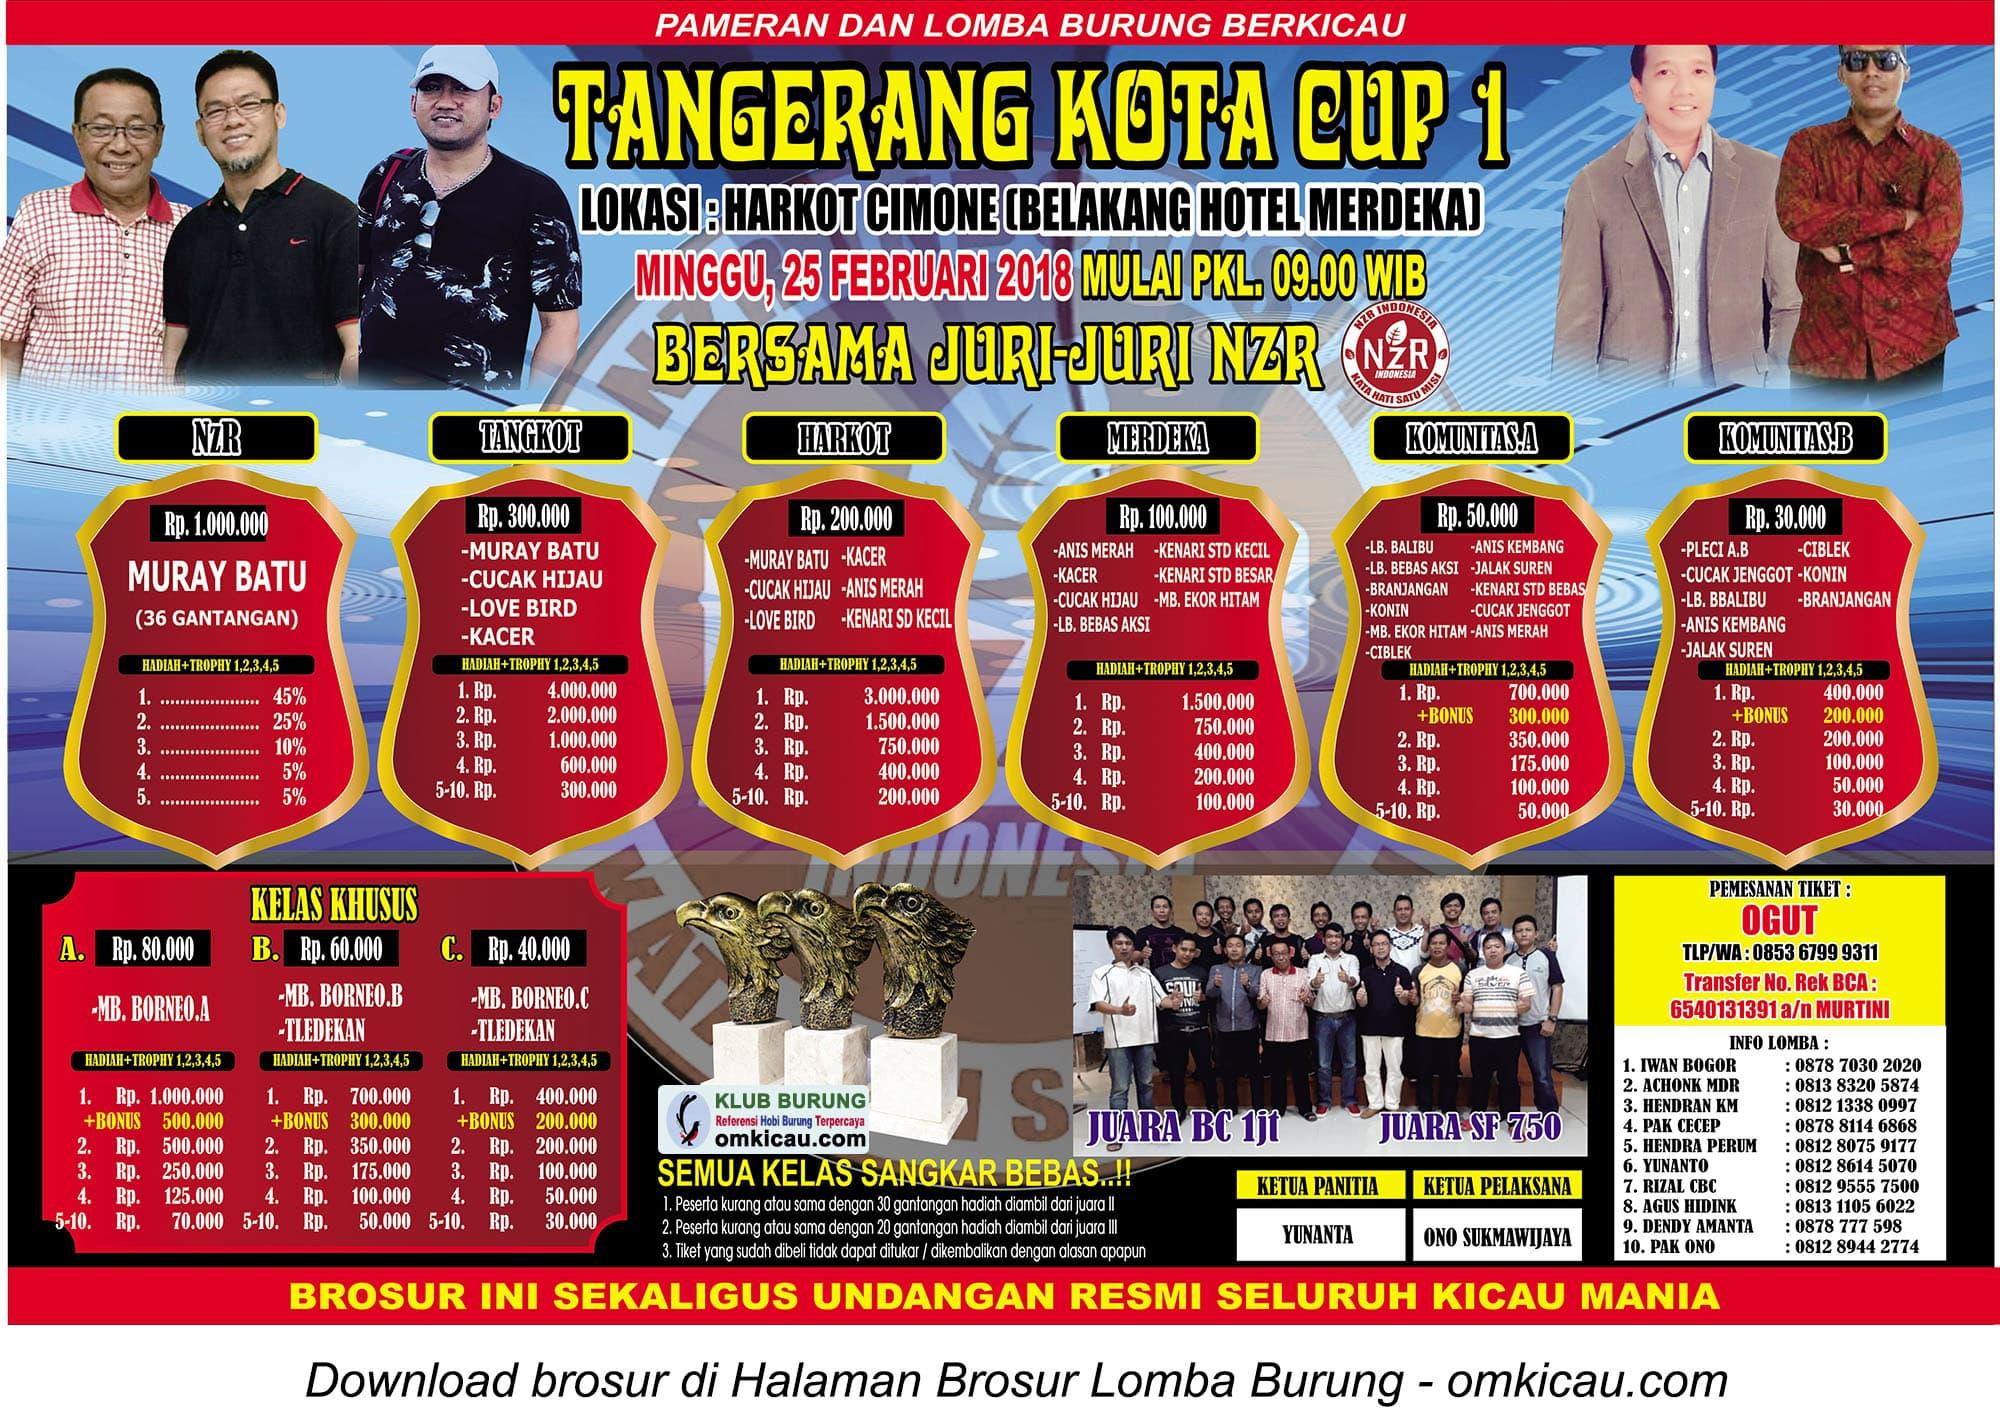 Tangerang Kota Cup 1